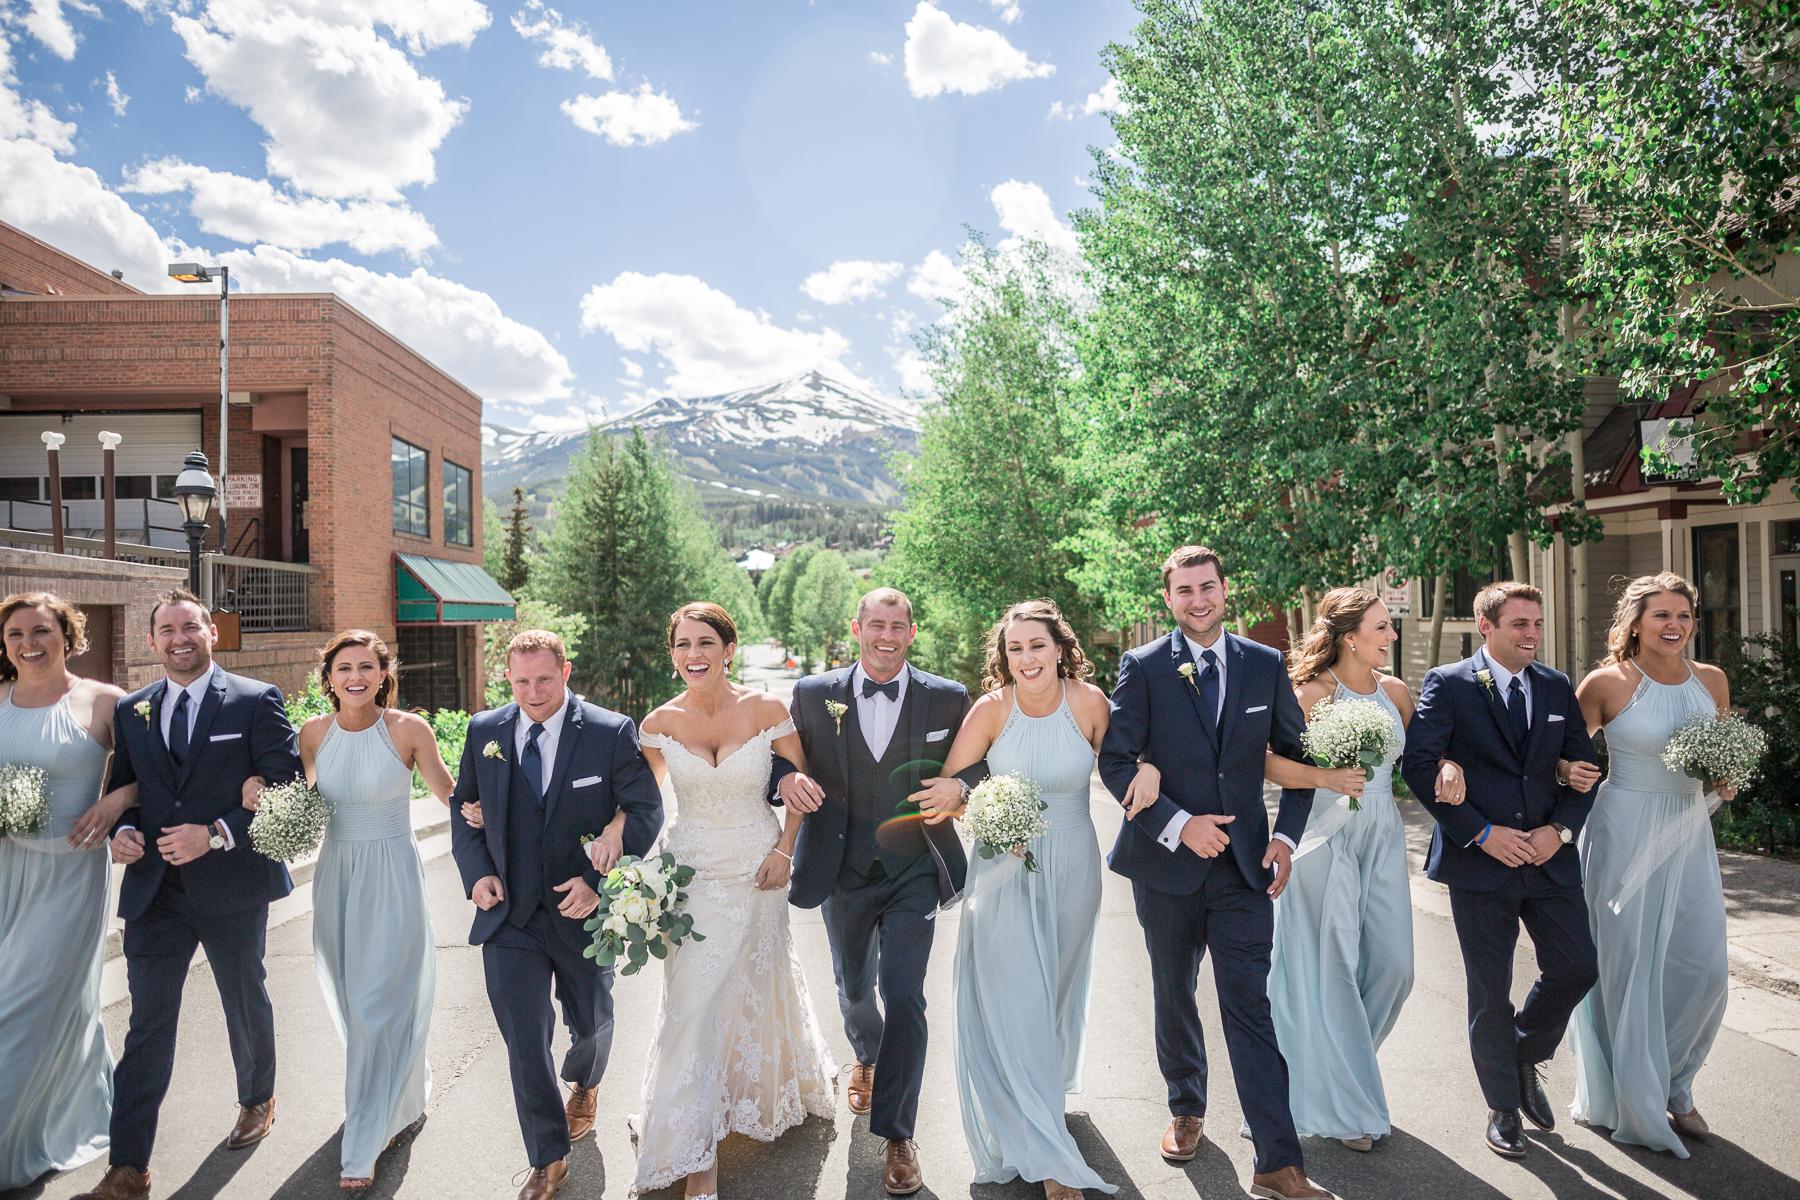 StaciDesign-Colorado-Wedding-4683.jpg